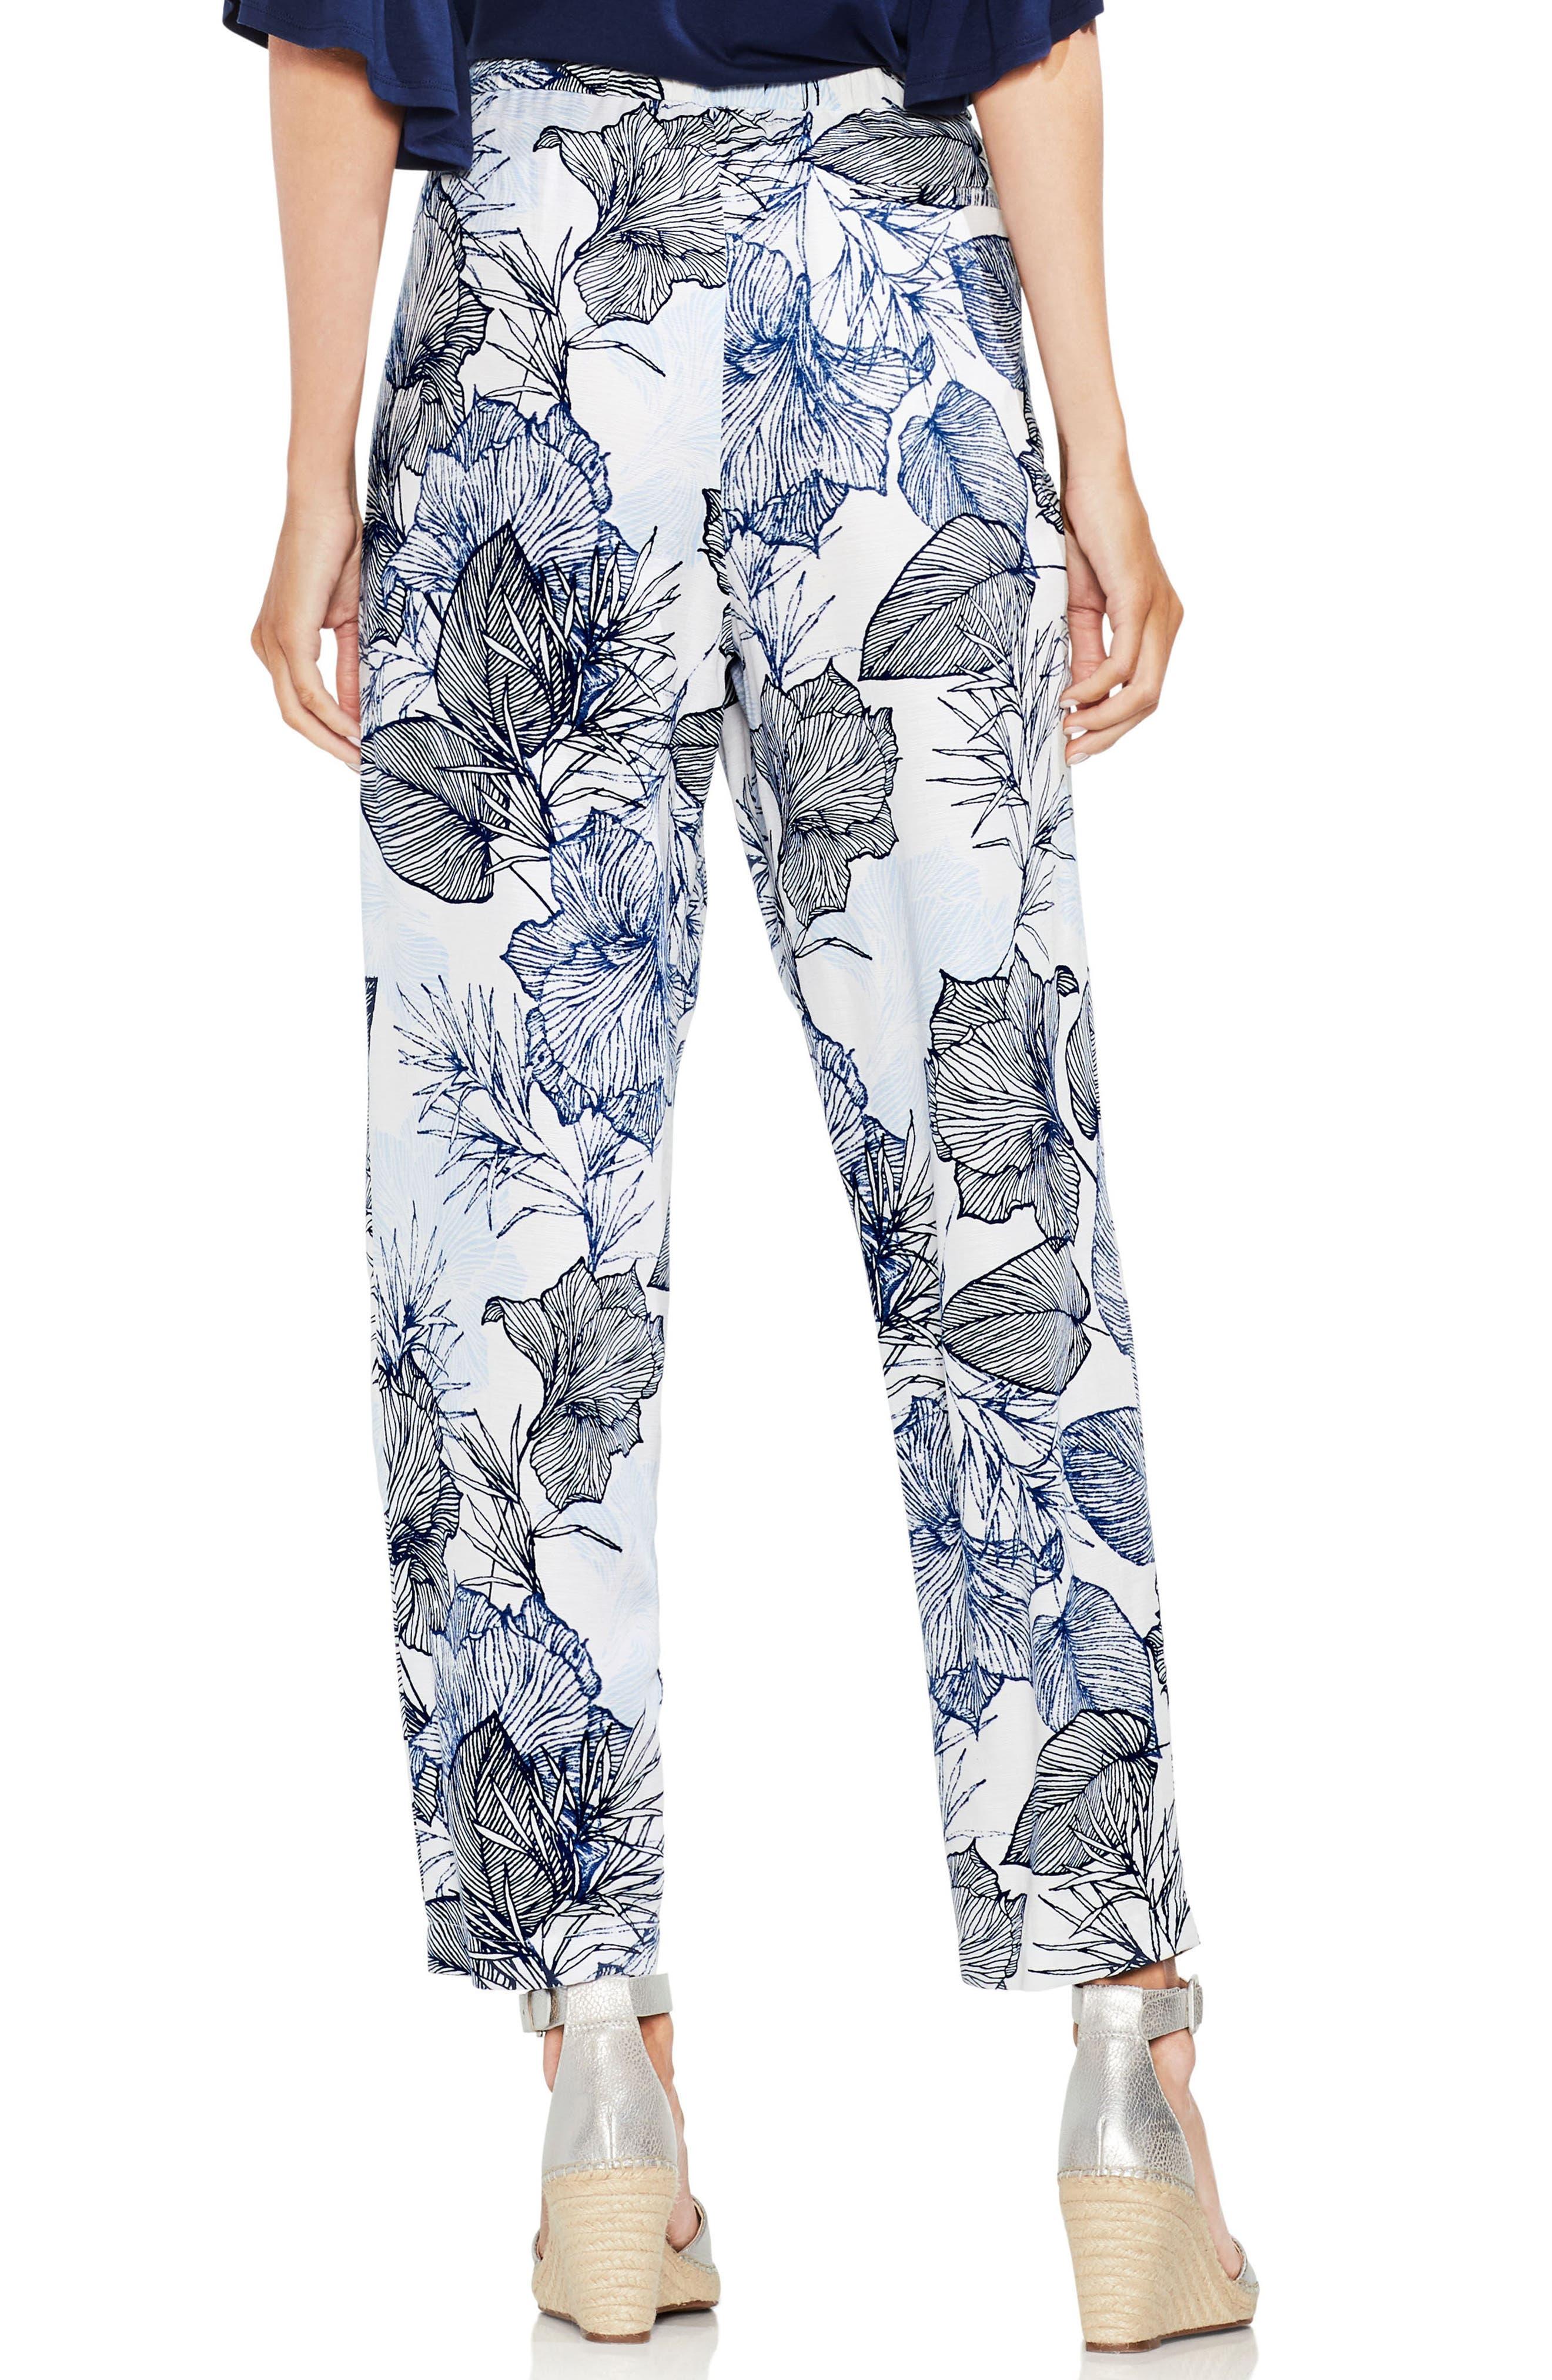 Etched Island Floral Slim Pants,                             Alternate thumbnail 2, color,